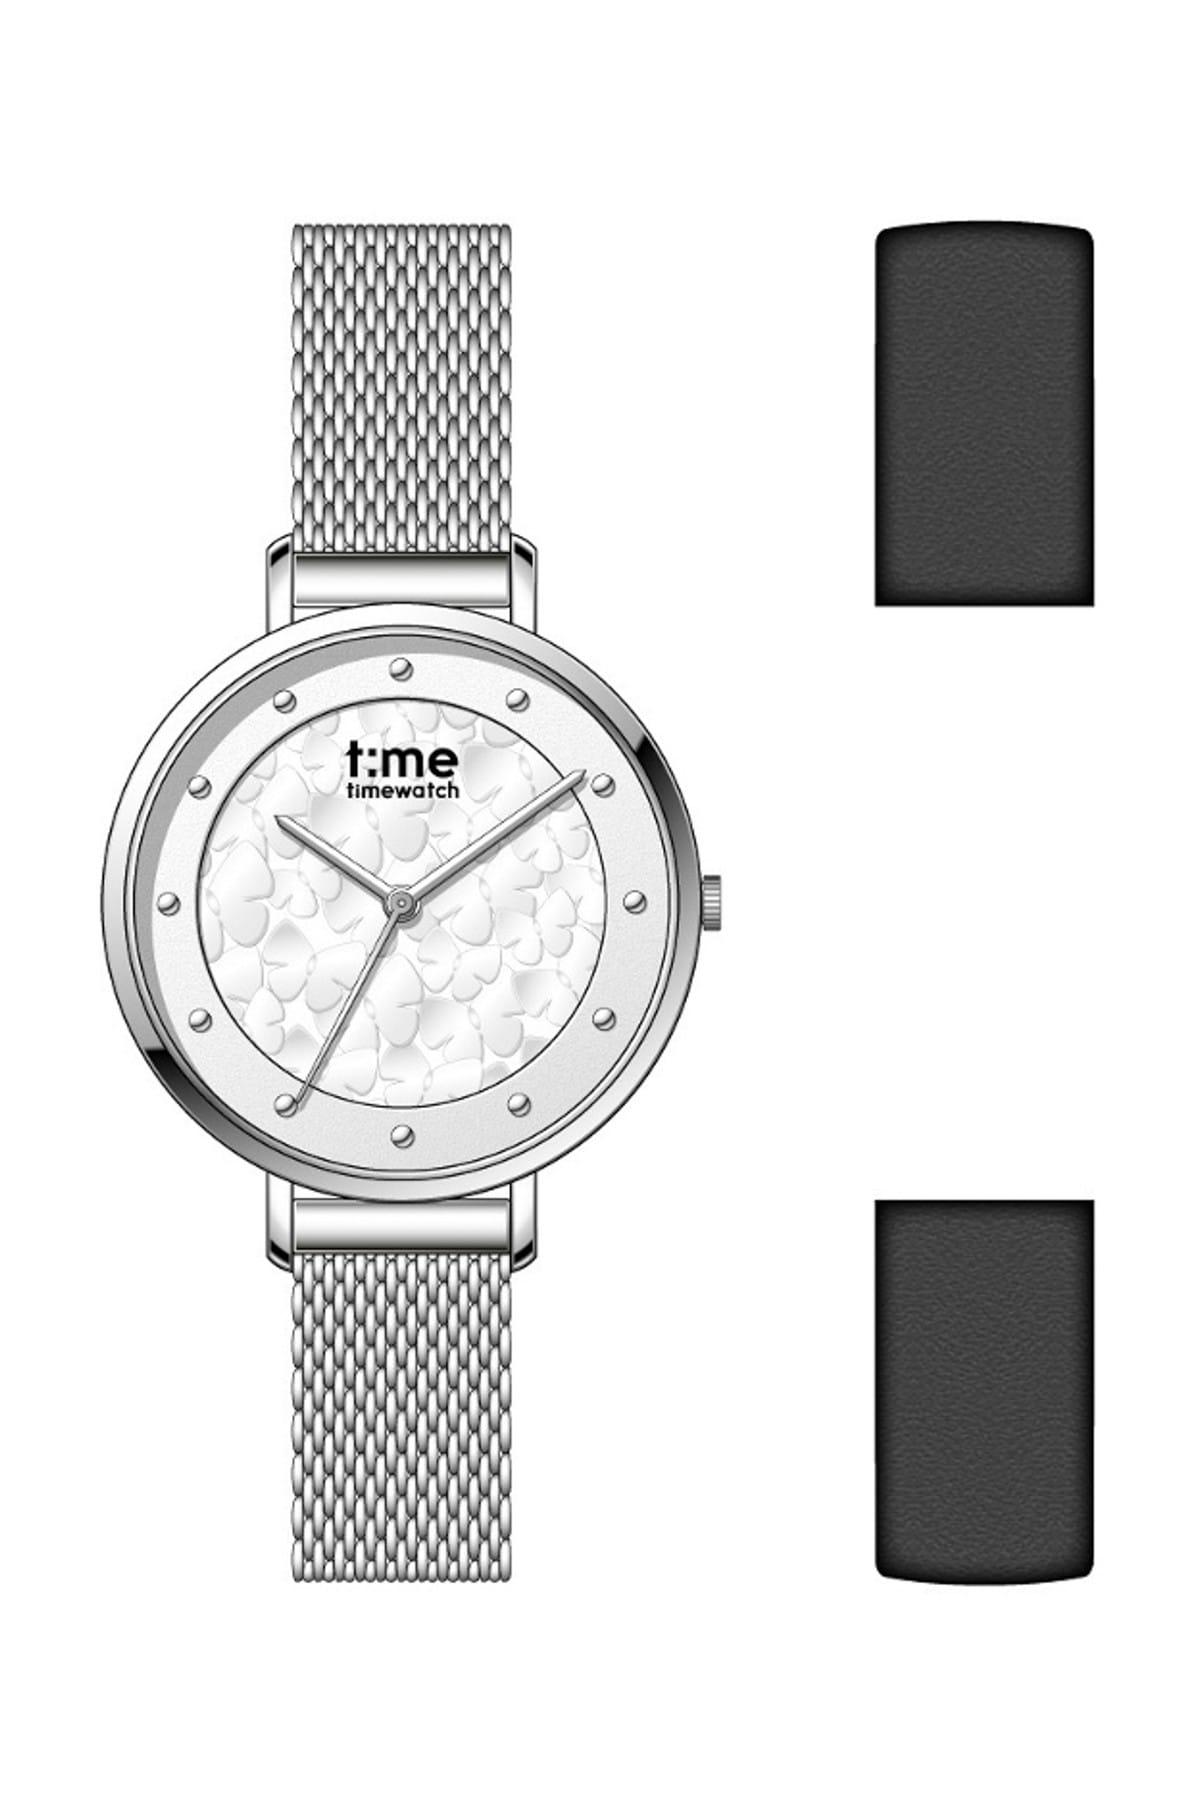 Timewatch Kadın Kol Saati TW.129.4CSC 1